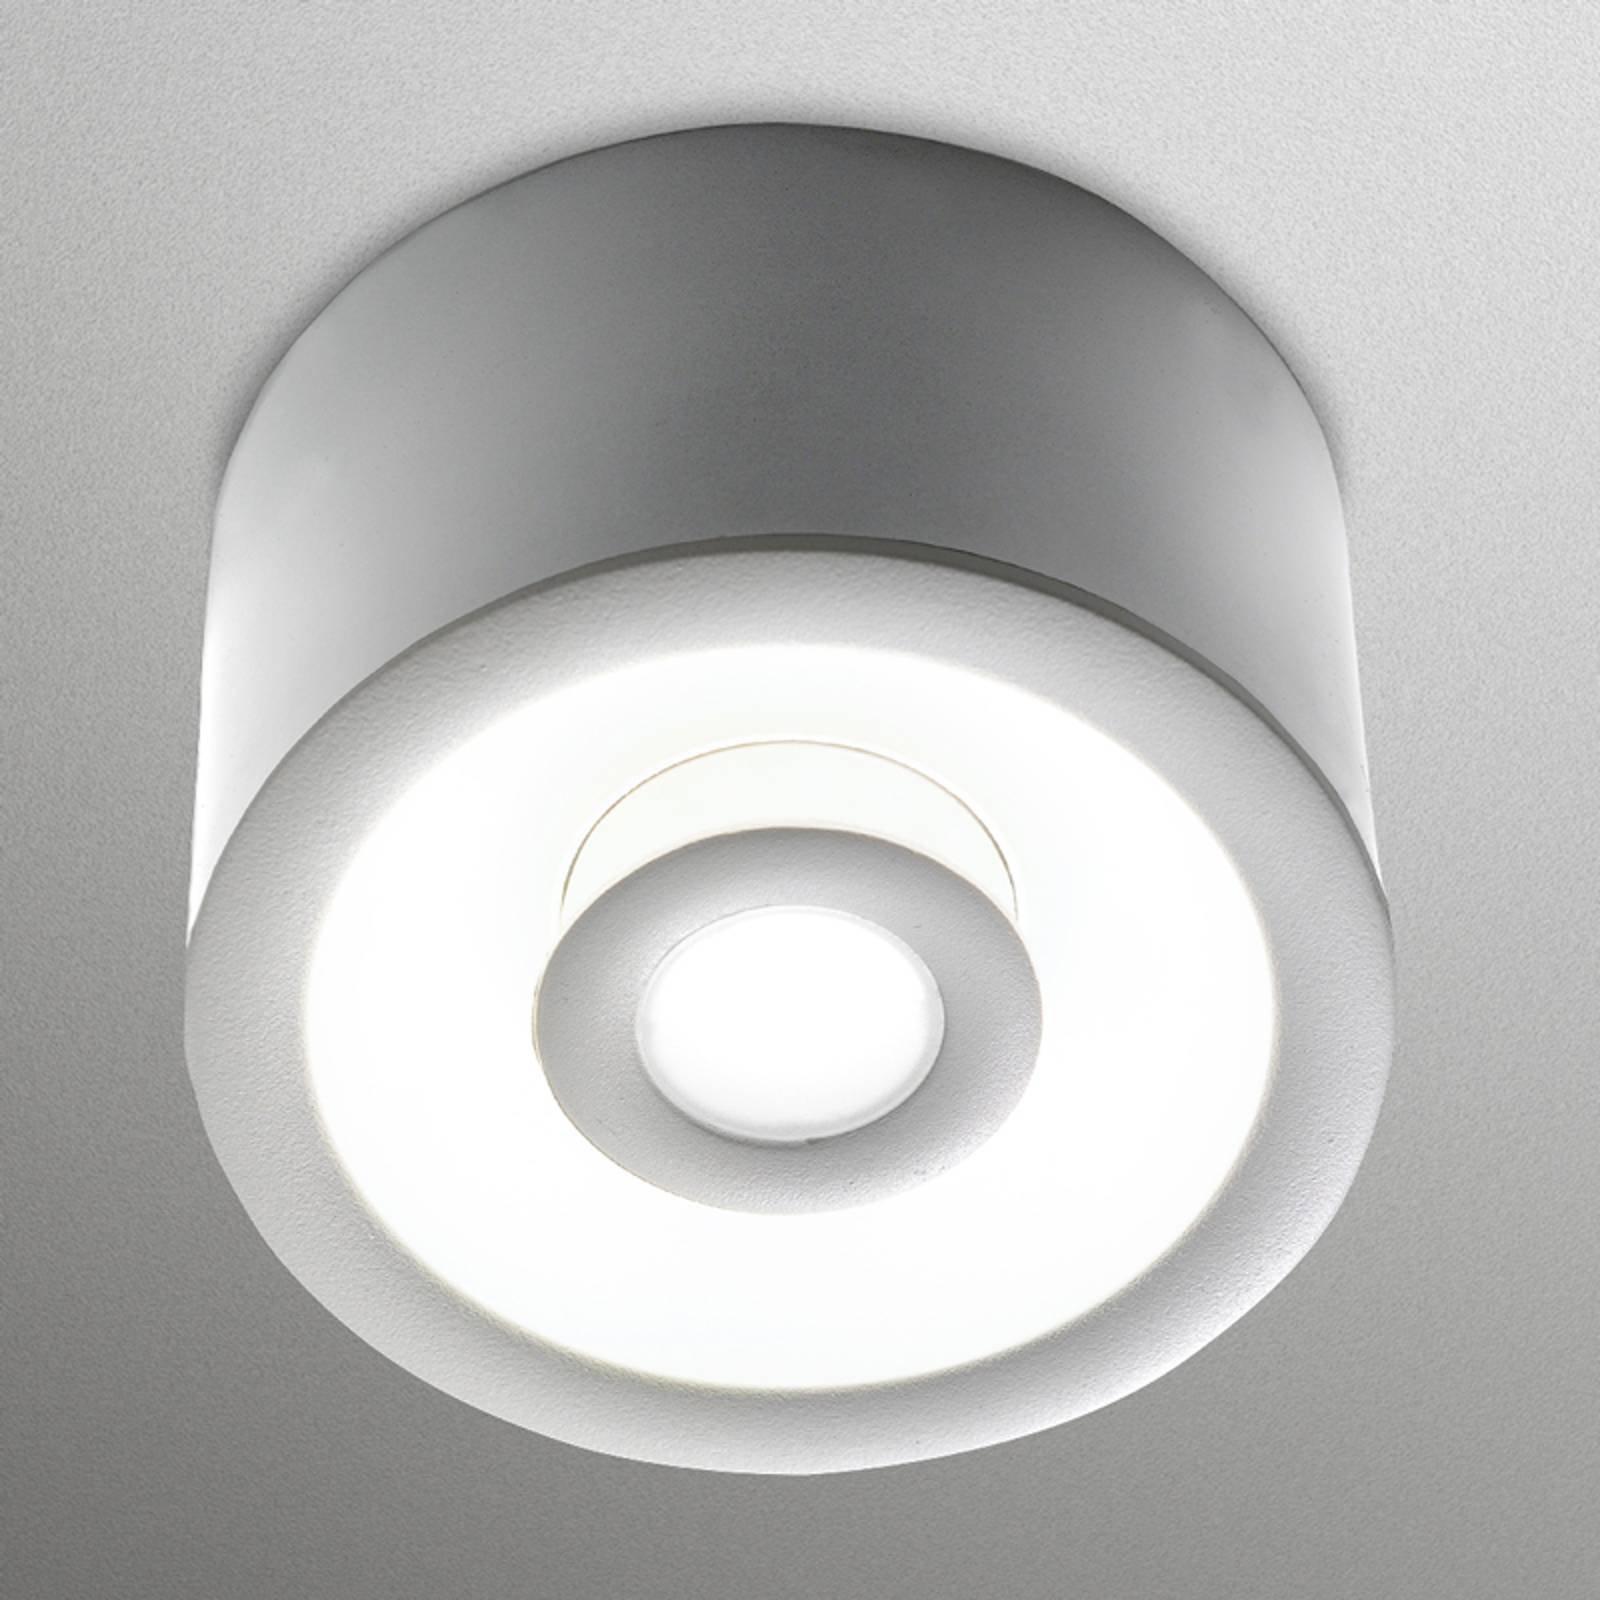 LED-taklampe Eclipse med innovativ teknologi